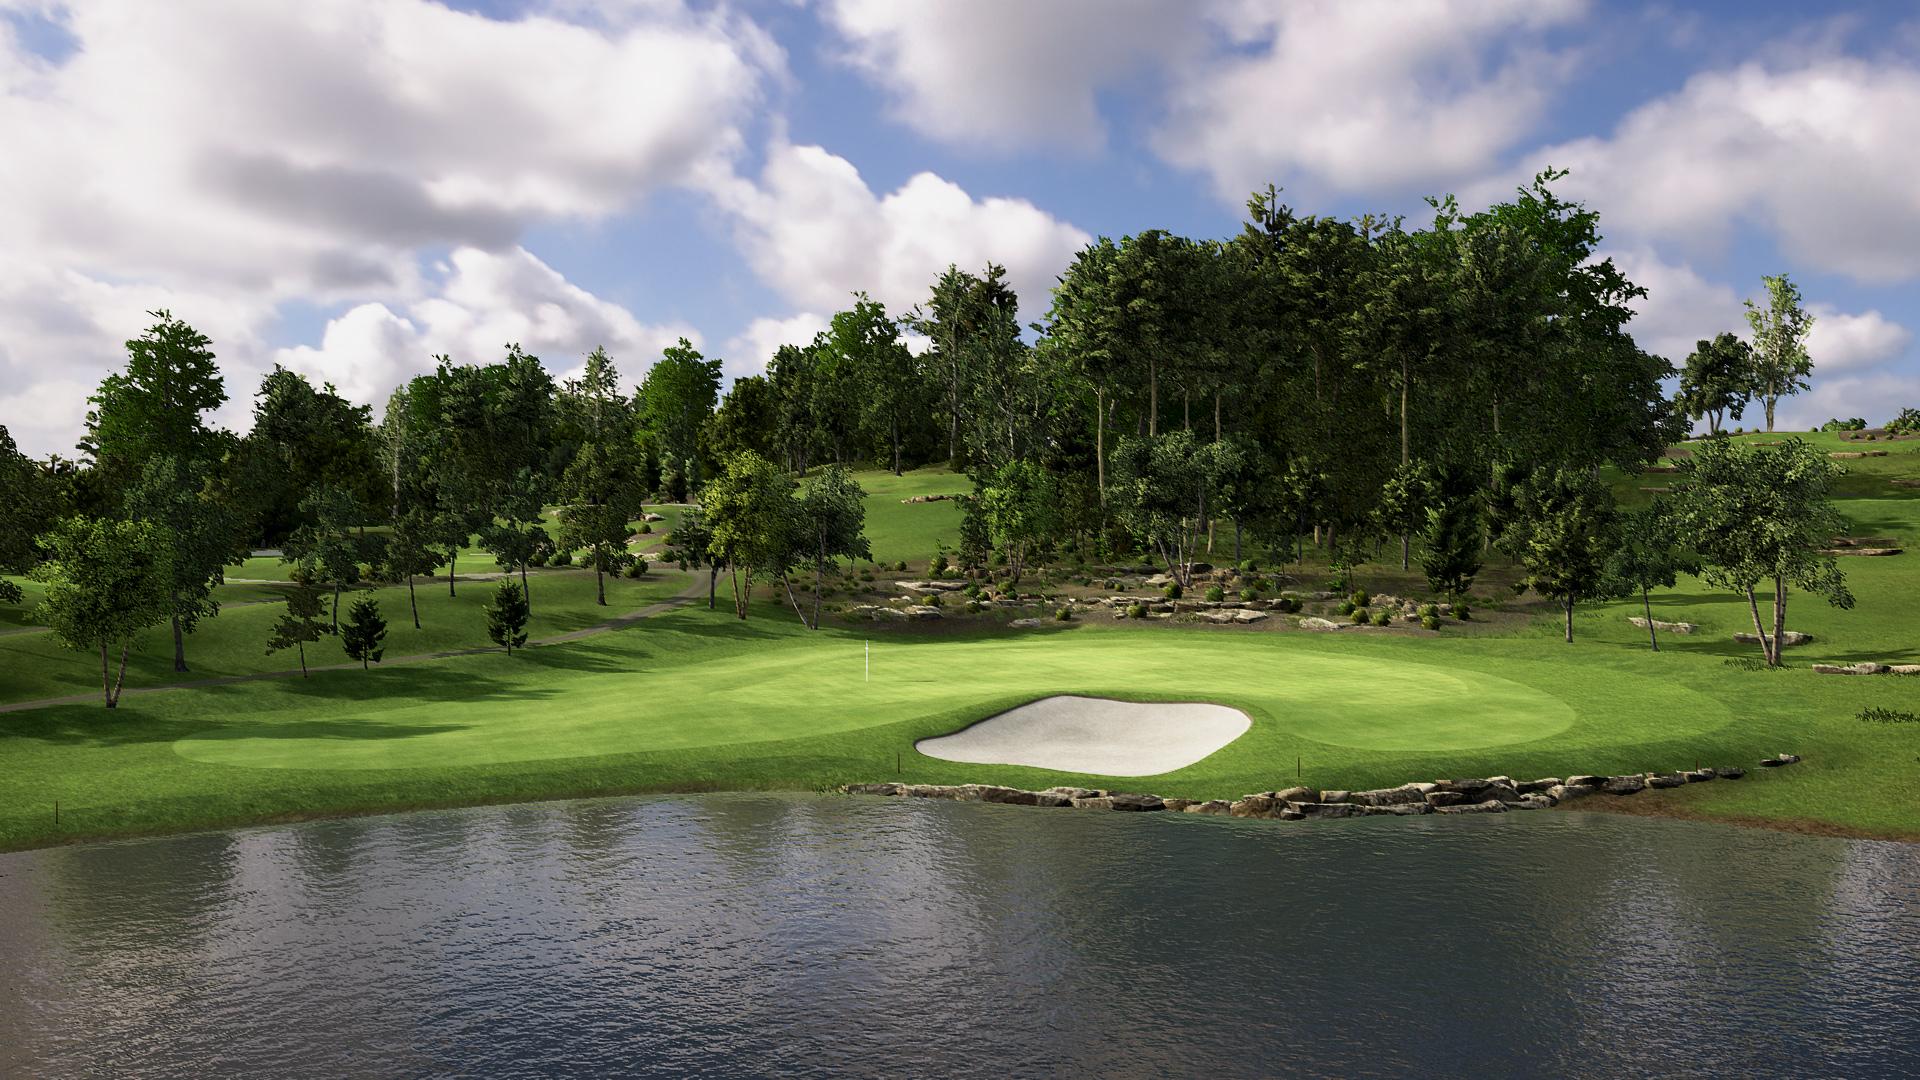 Trackman Golf Simulator Best Indoor Golf Simulator 2020